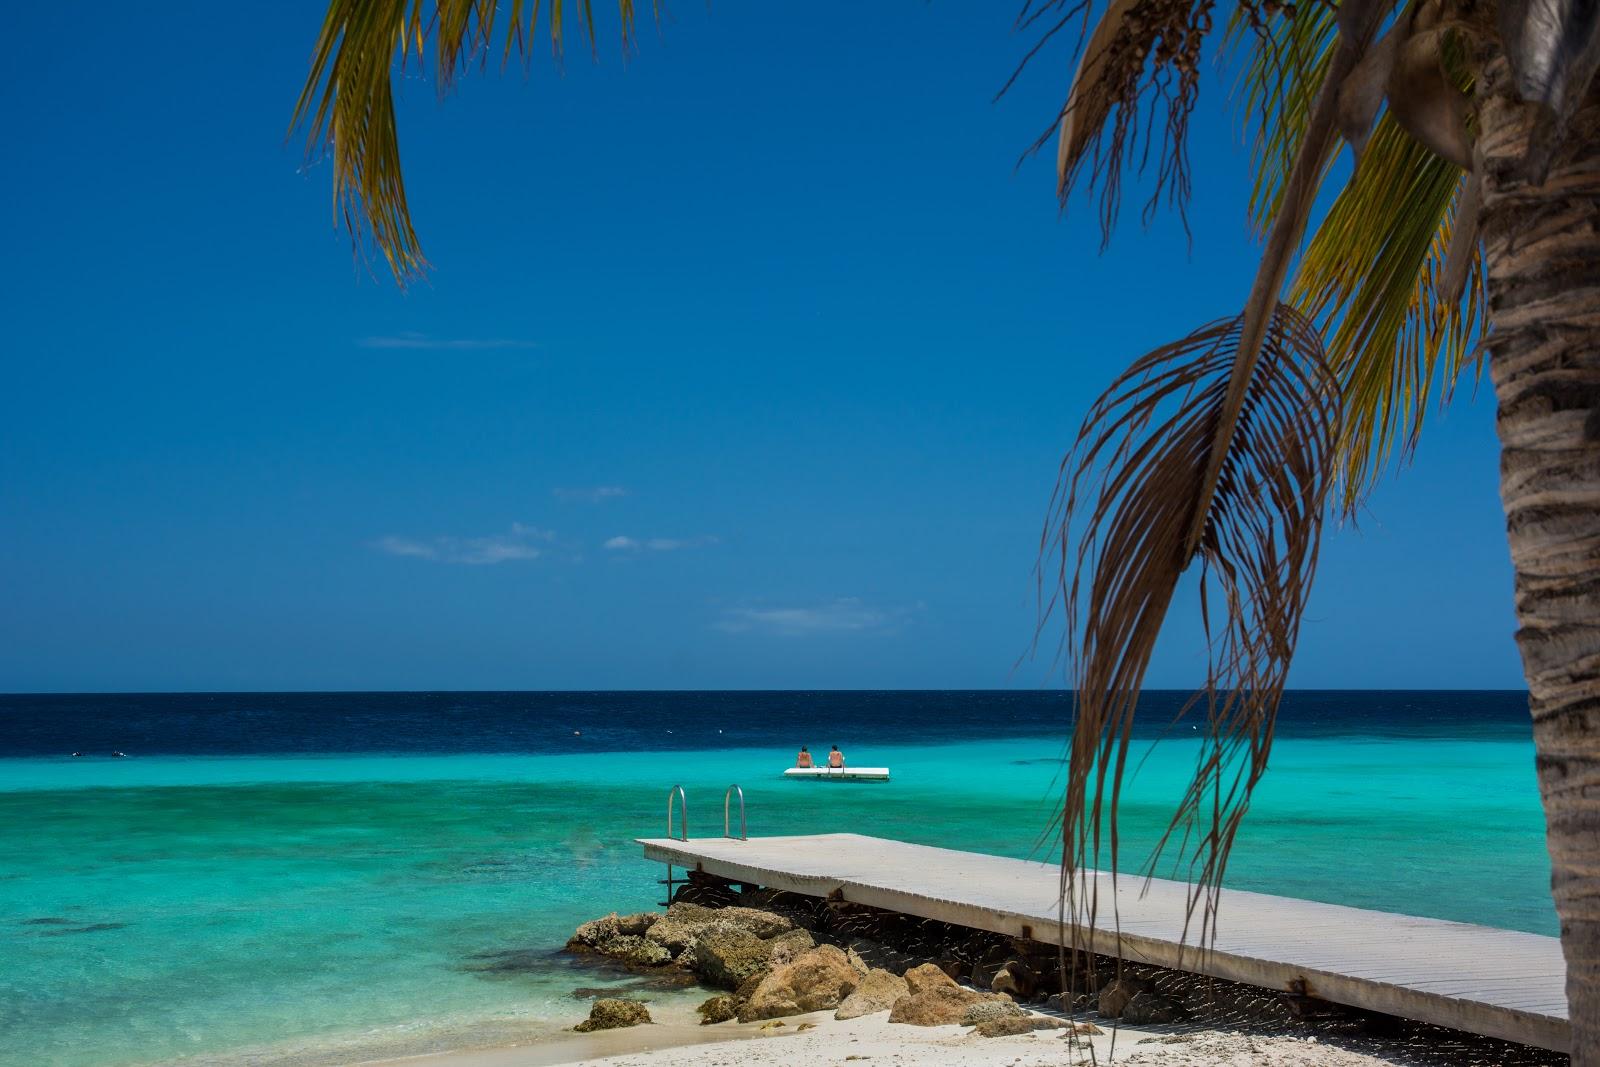 beach-holiday-vacation-caribbean.jpg